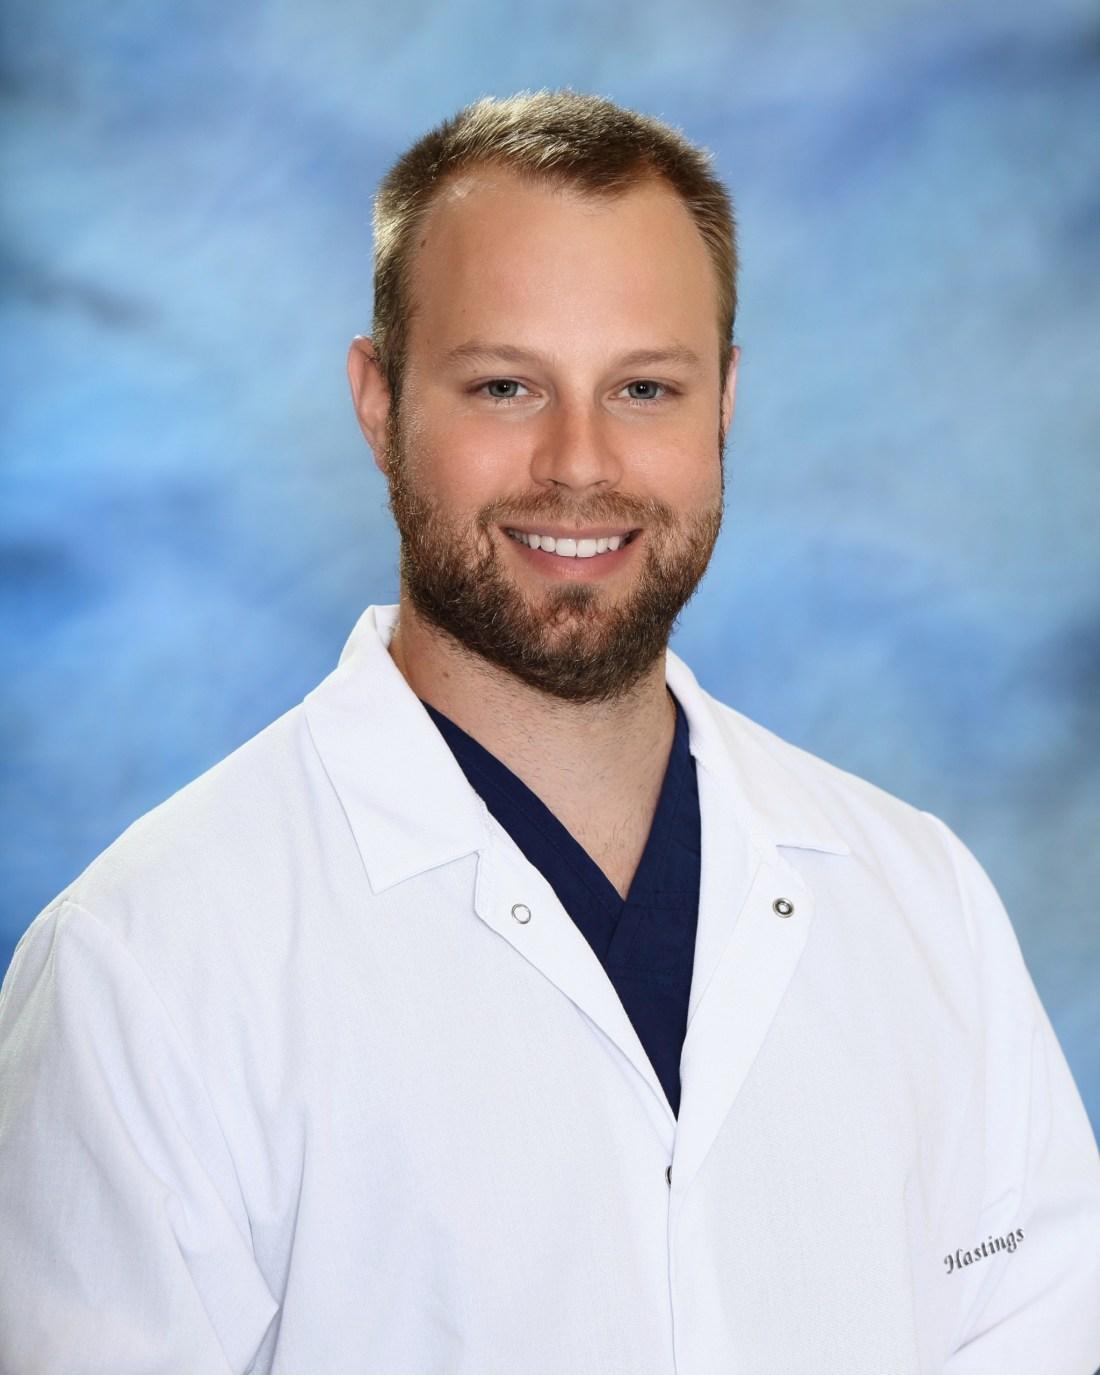 Dr. Jeff Johnson, DDS